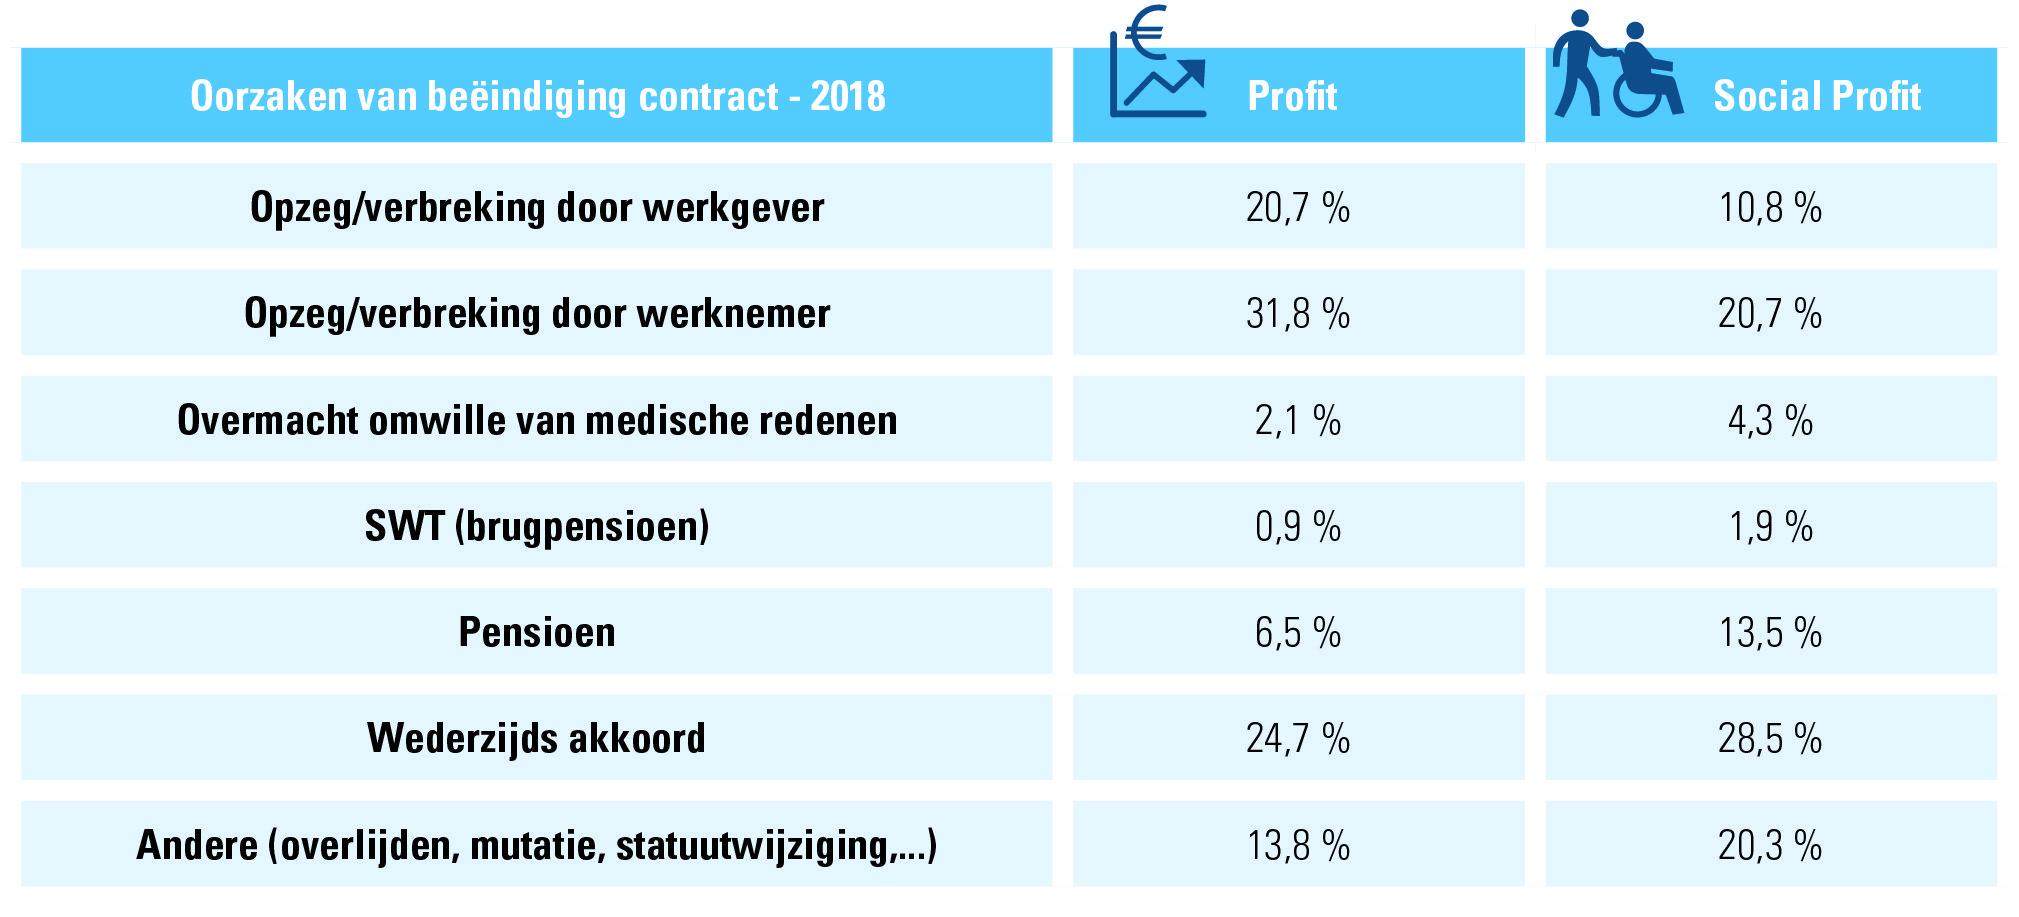 Tabel 5: arbeidsovereenkomsten onbepaalde duur 2018, redenen van beëindiging profit vs. social profit